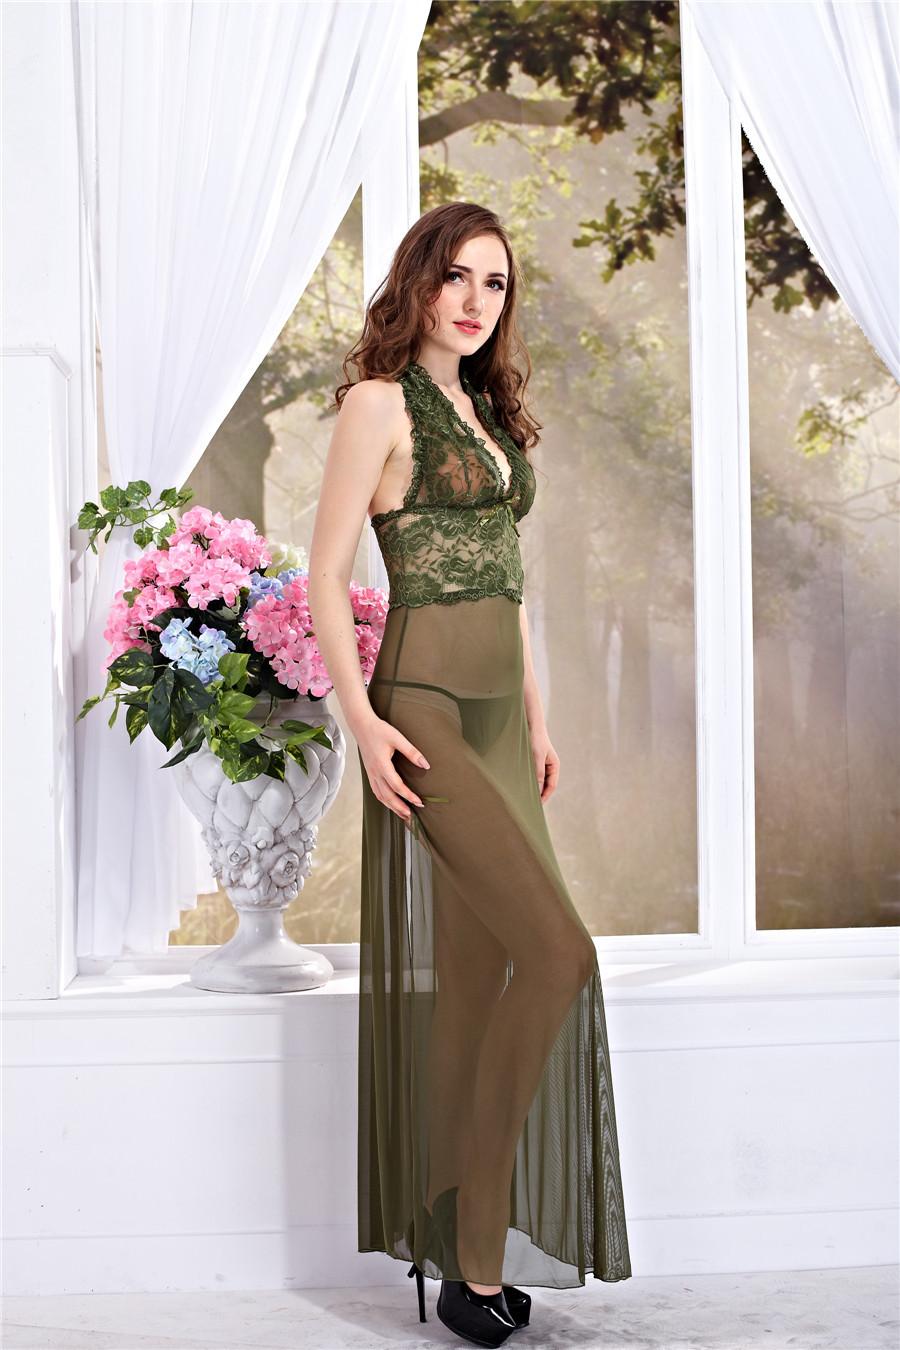 JiaHuiGe Sexy Lingerie Hot Erotic Lace Lingerie Dress for Ladies Women Babydoll Sexy Lingerie Dress Transparent Sleepwear Sex